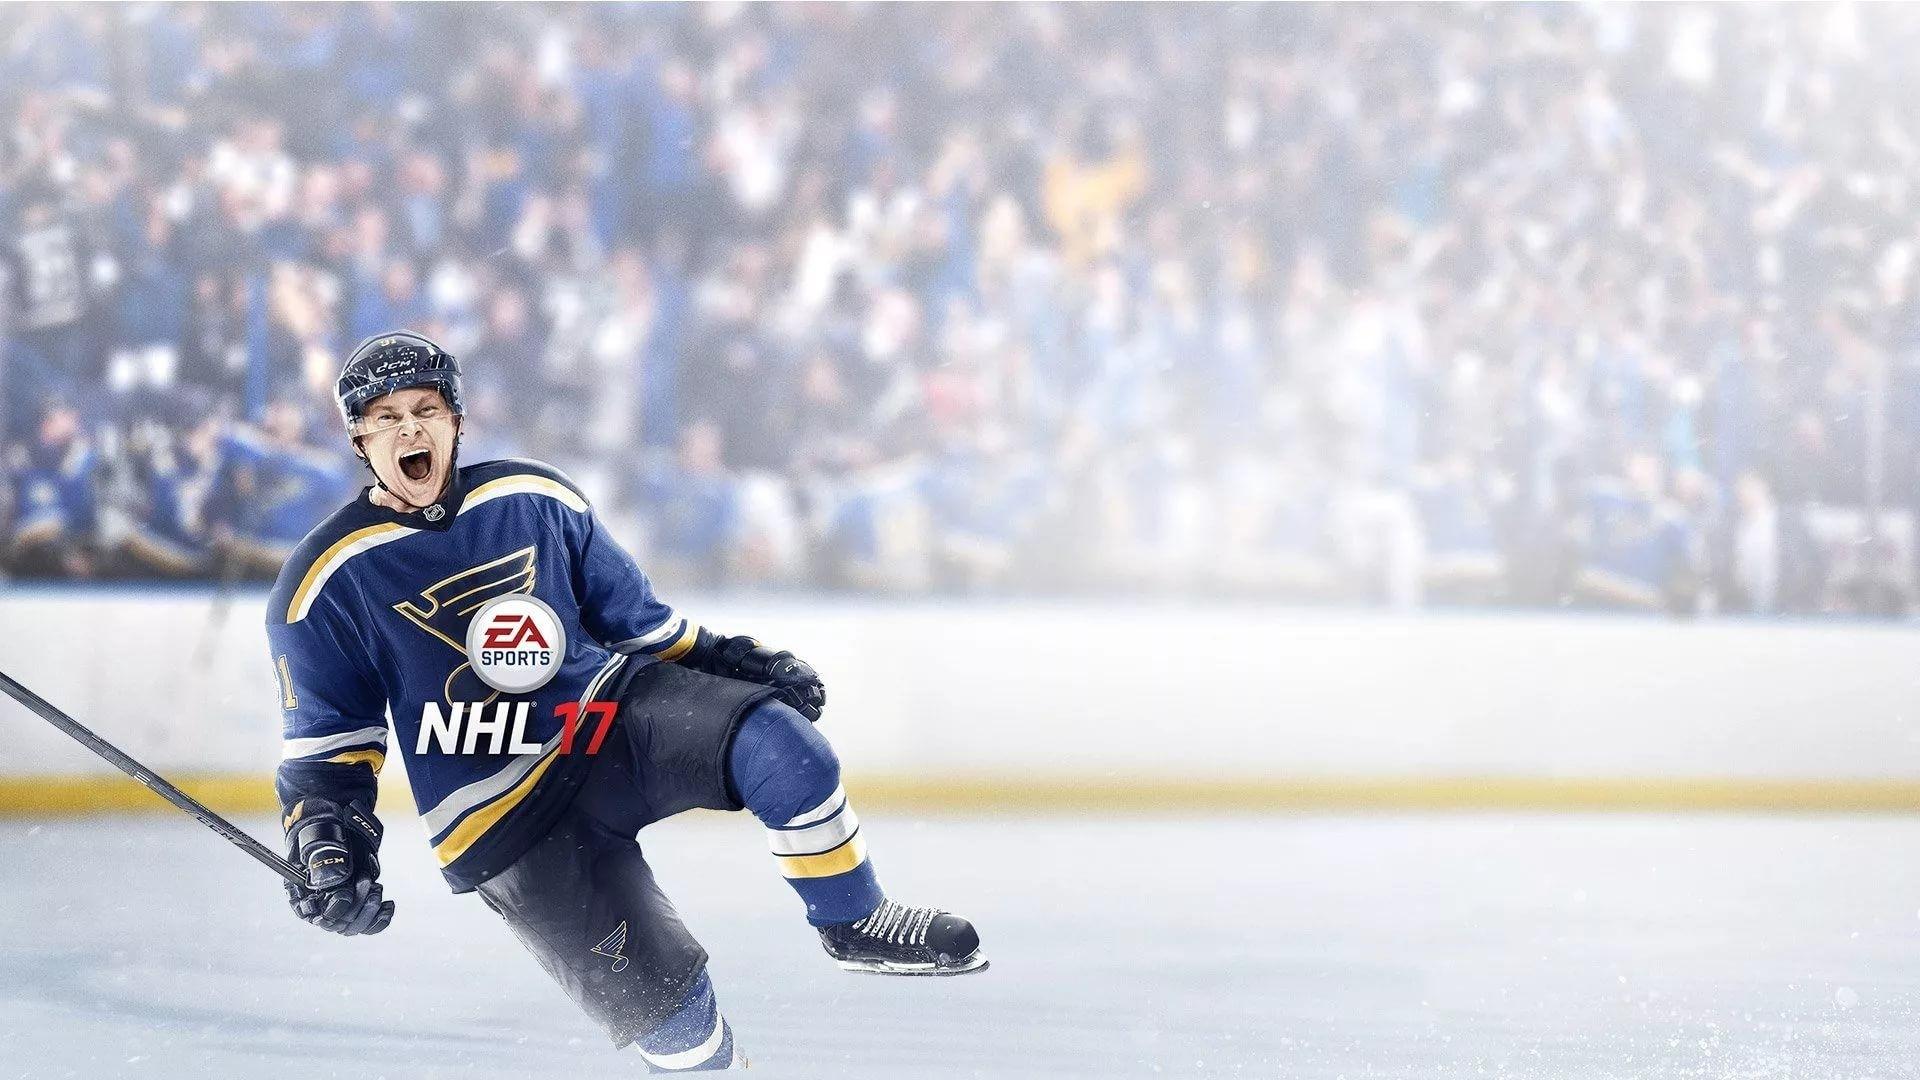 Hockey Background Wallpaper